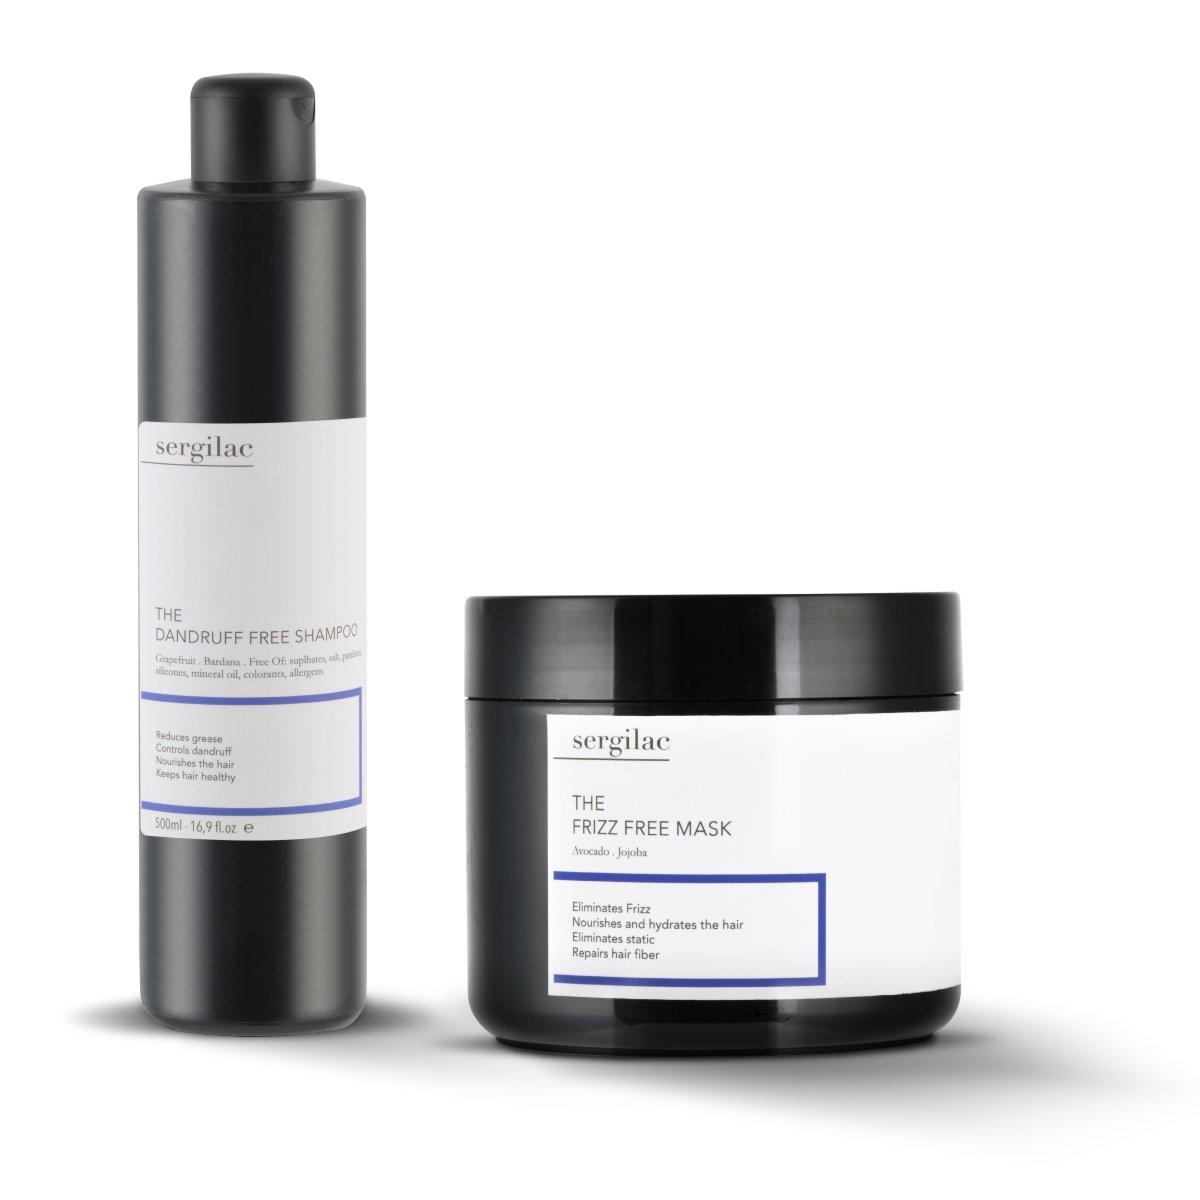 Lote Sergilac - The Dandruff Free Shampoo + Mask Free Frizz